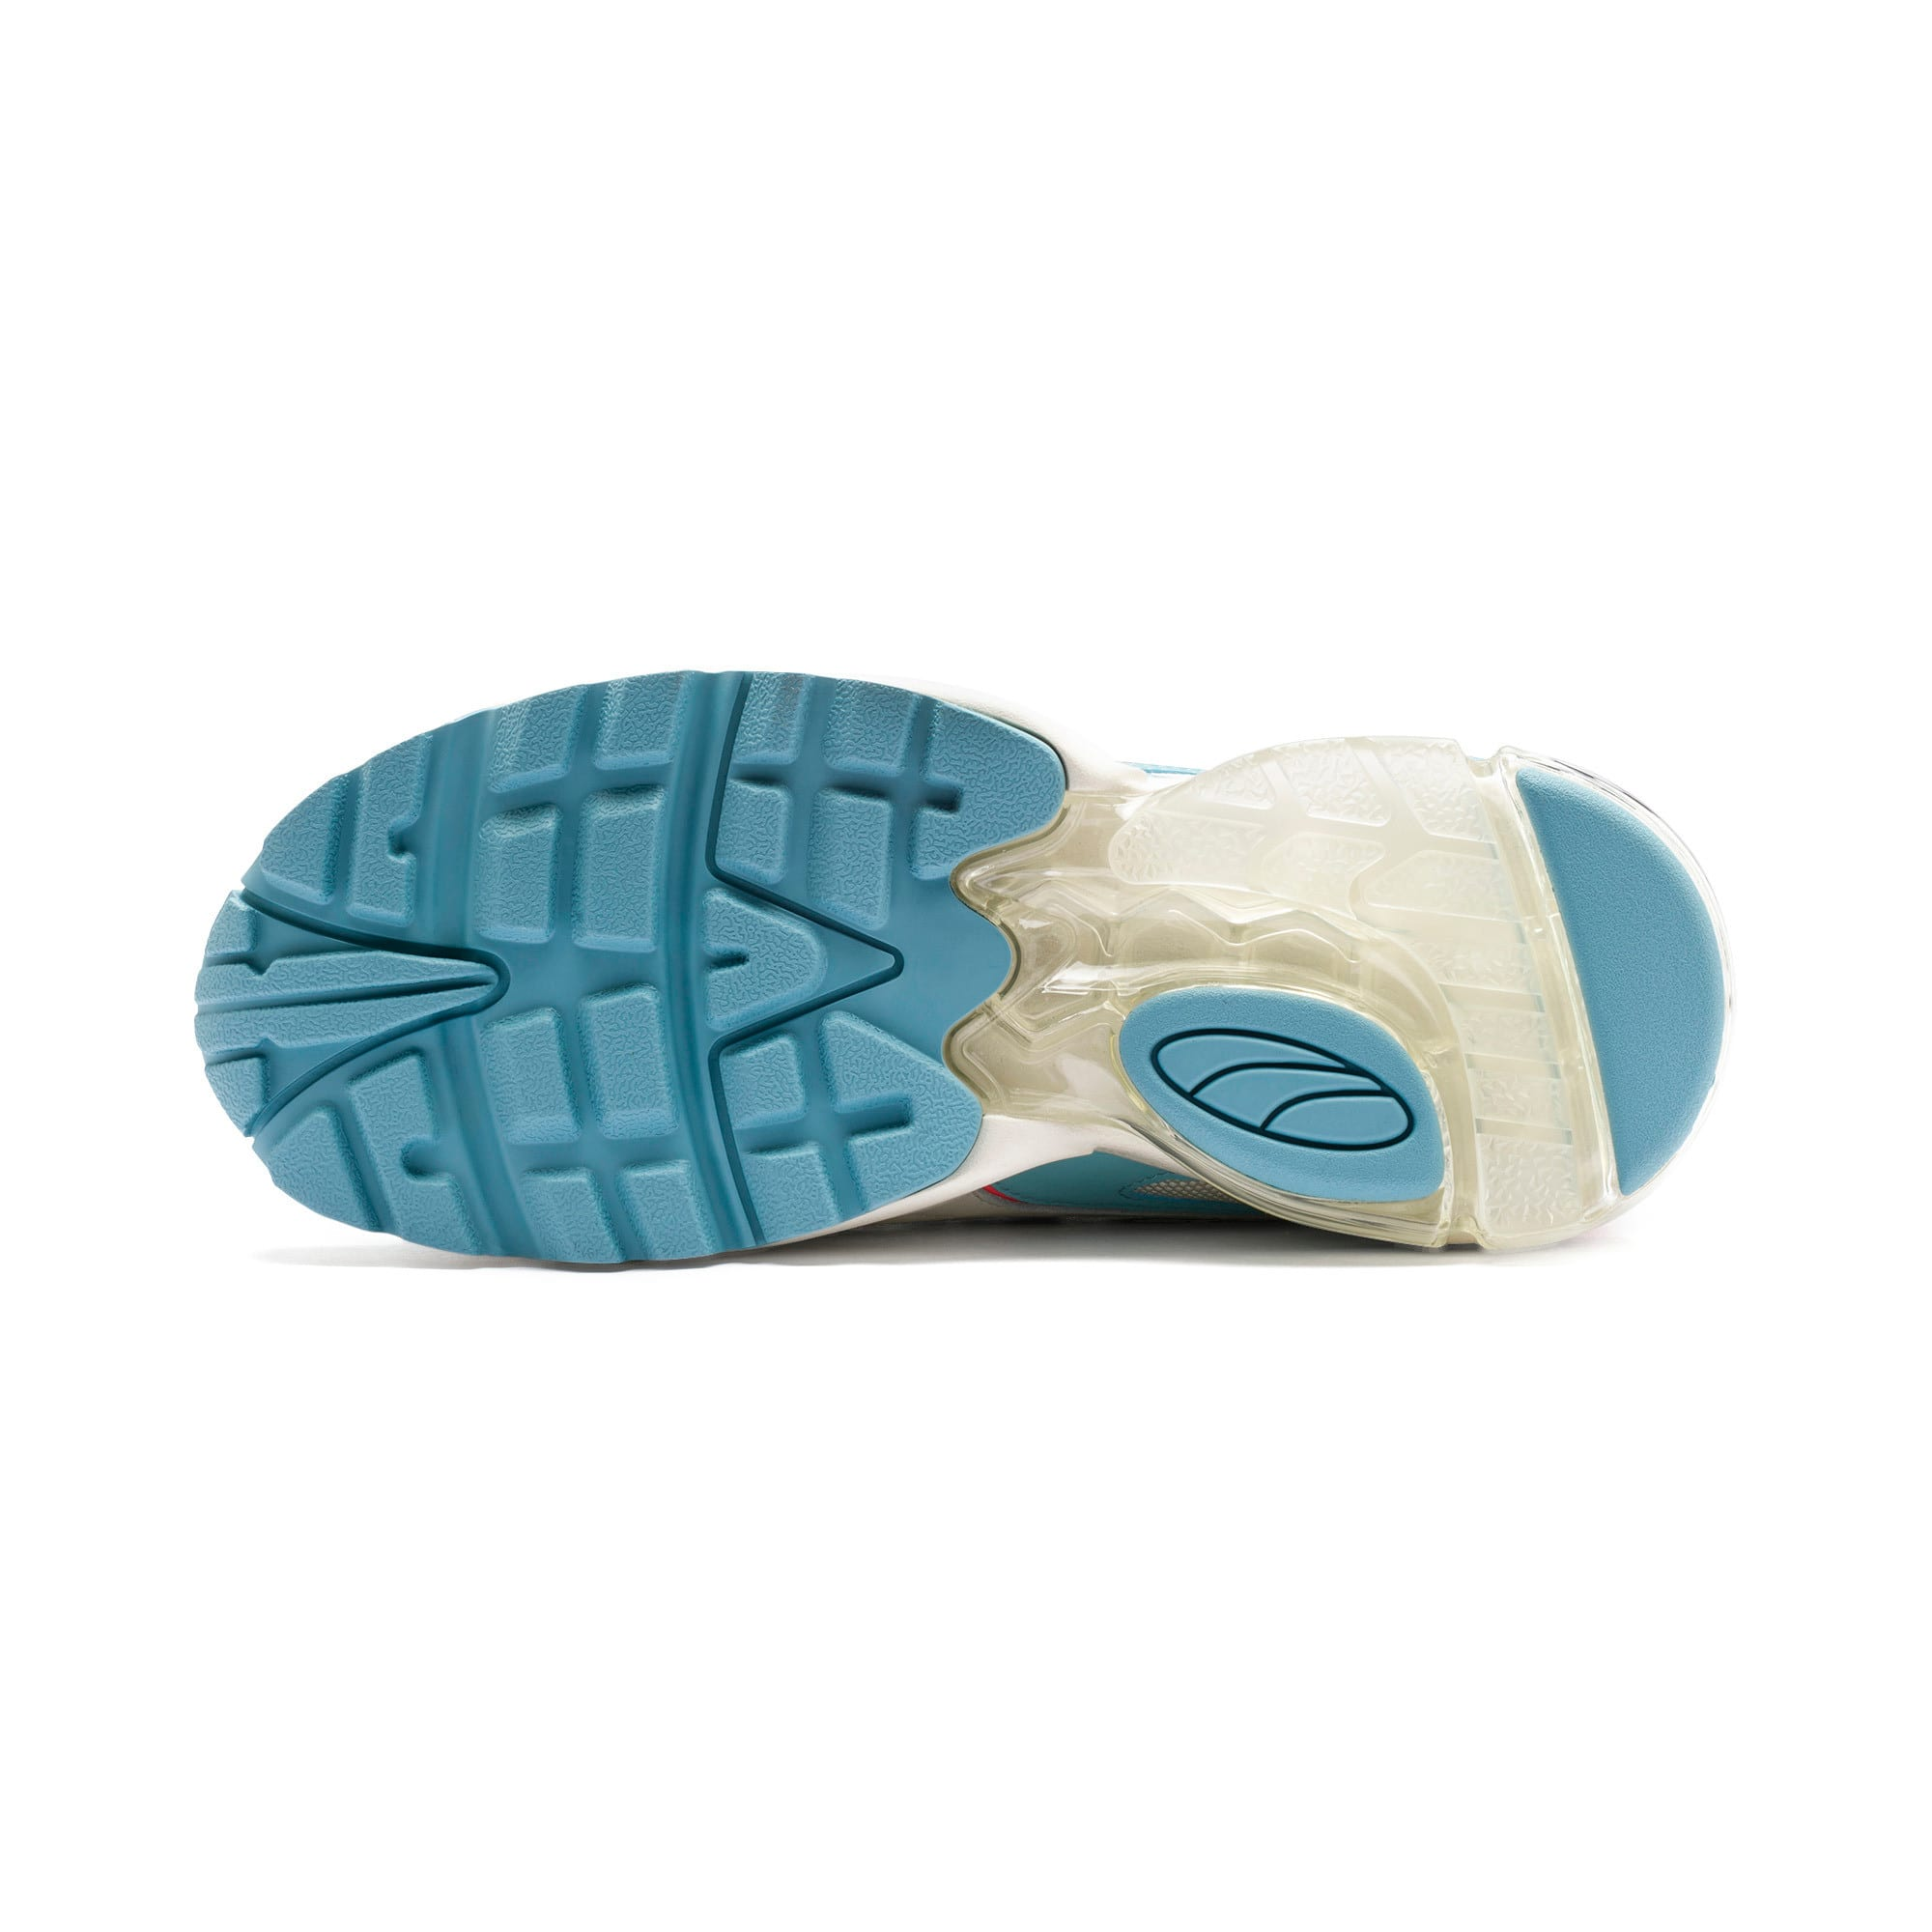 Thumbnail 5 of CELL Stellar Women's Sneakers, Milky Blue-Puma Team Gold, medium